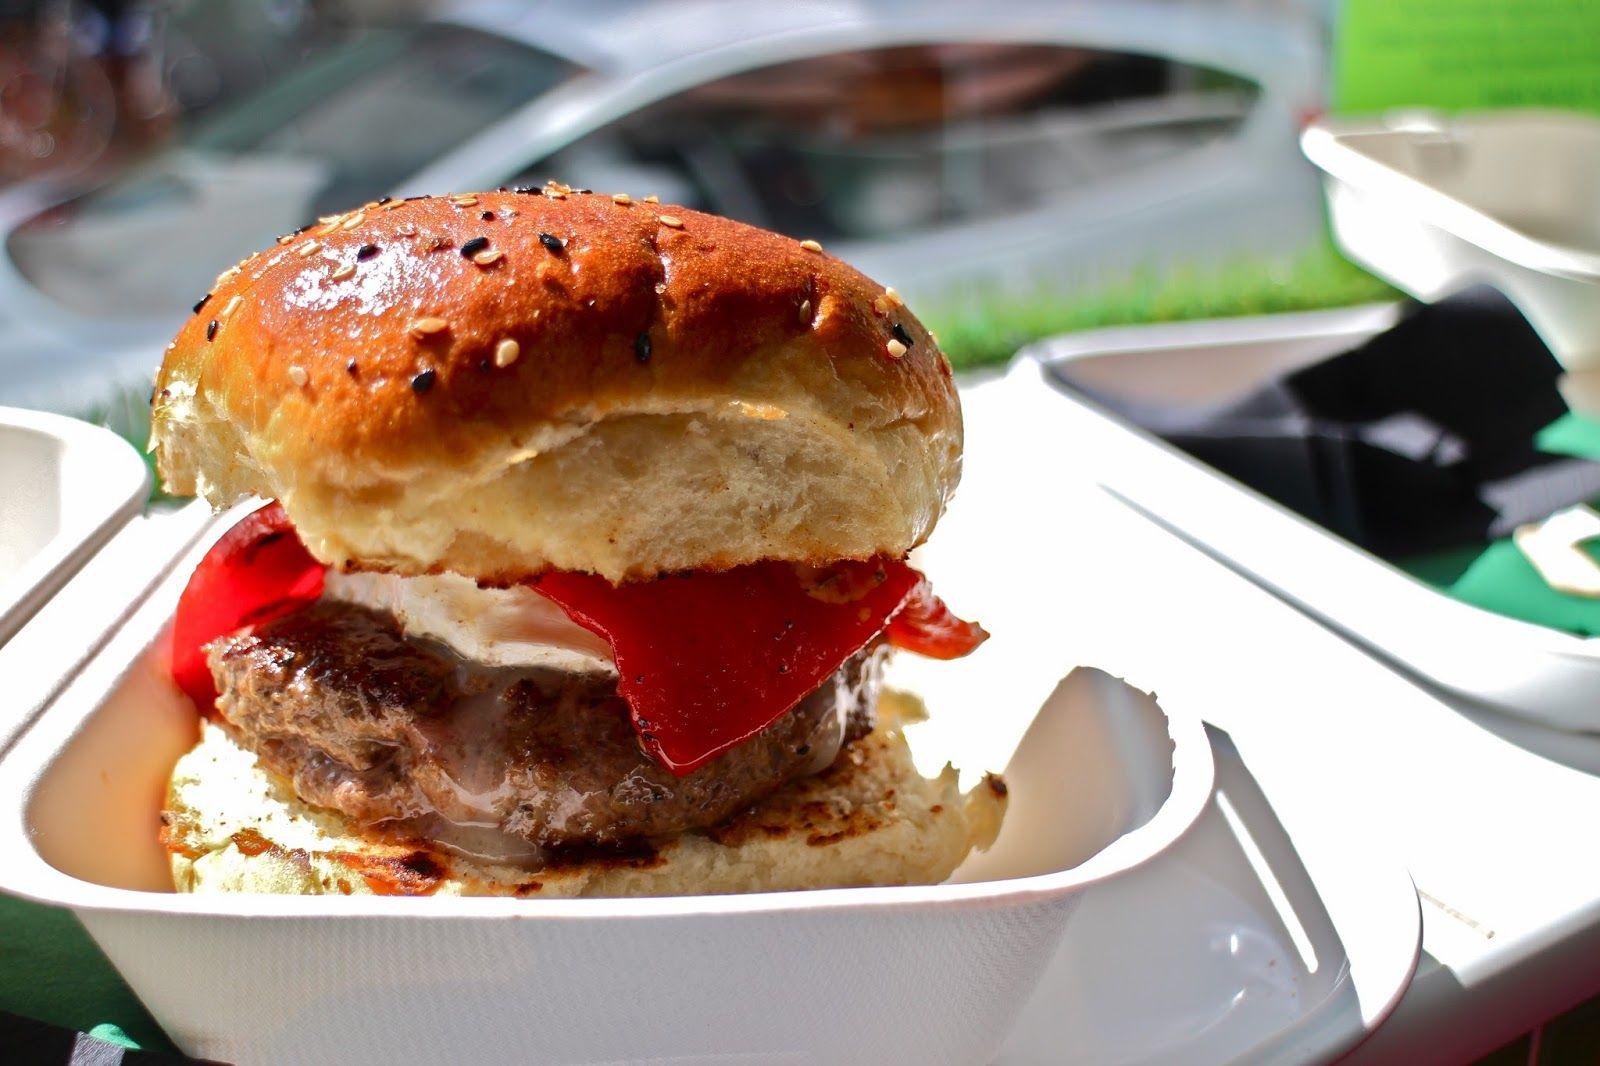 wander to wonder burger brothers & brighton food festival